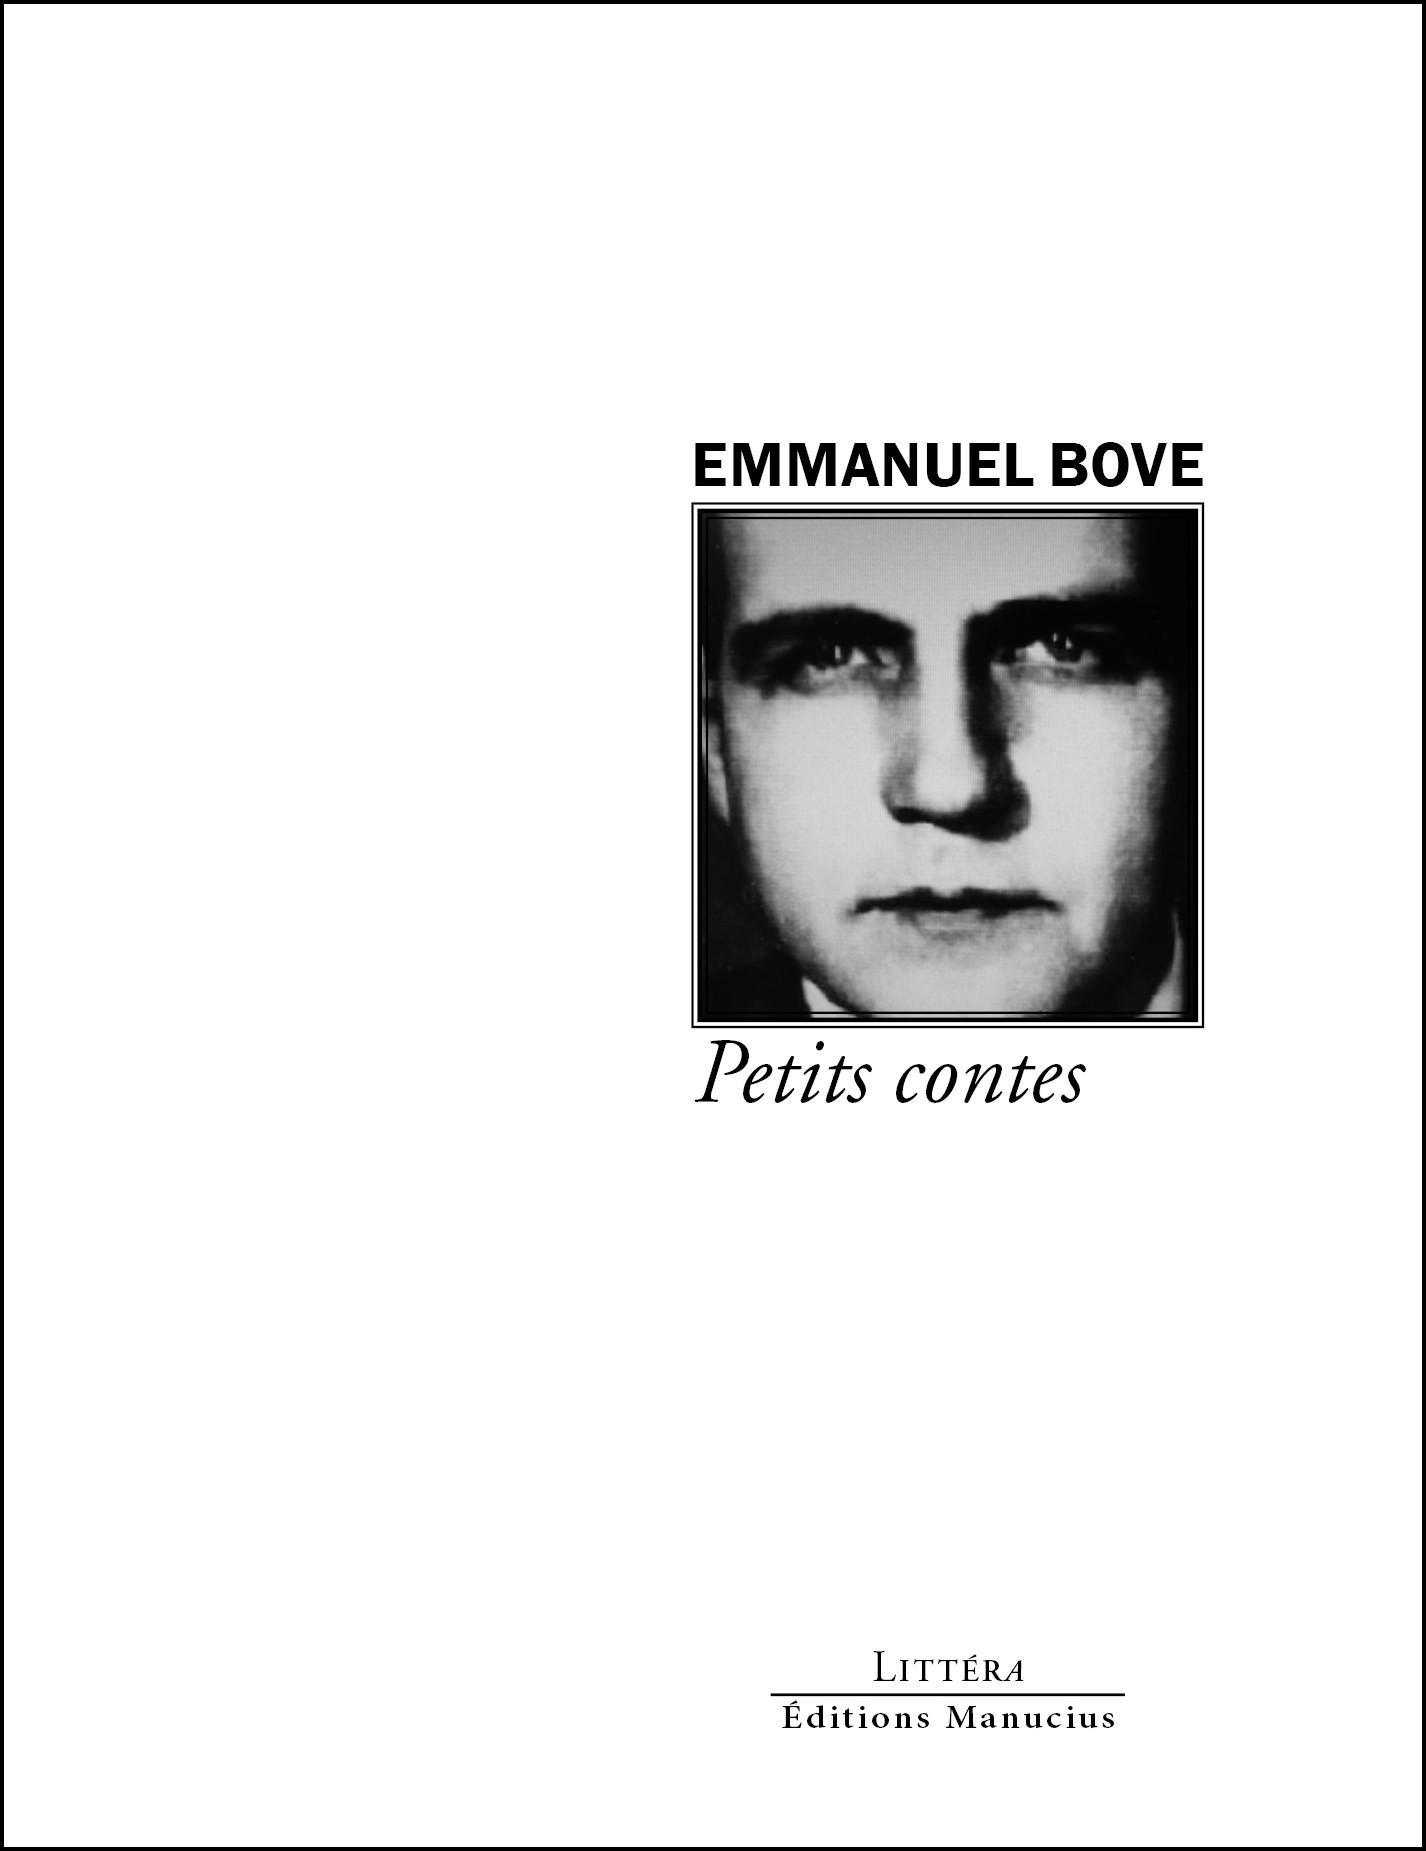 E. Bove, Petits contes